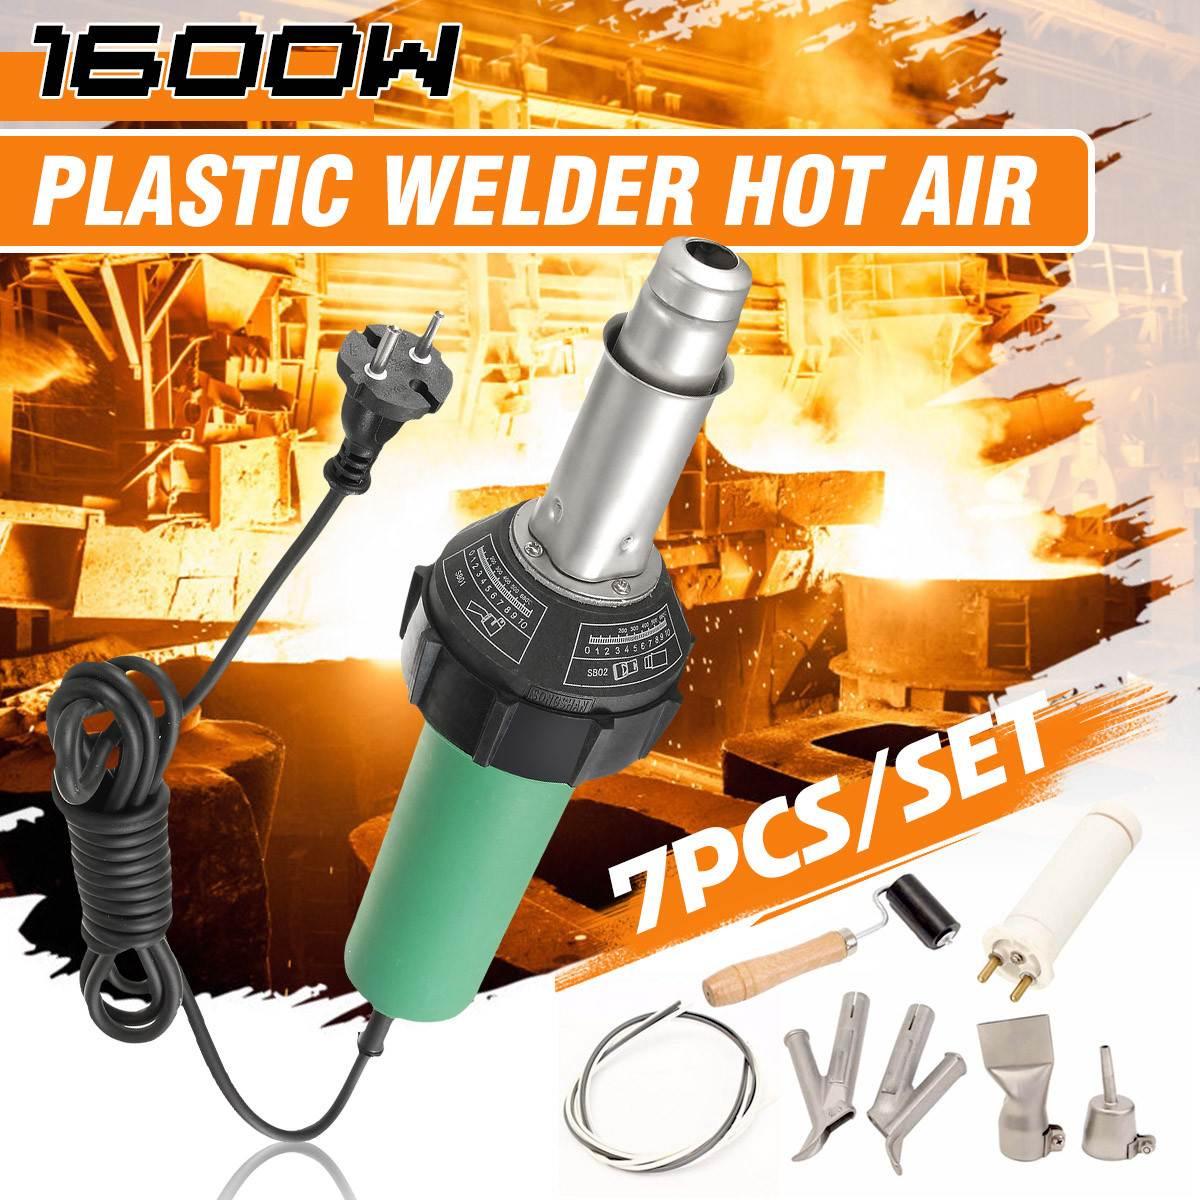 7PCS/Set AC 220V 1600W 50/60Hz Hot Air Torch Plastic Welding-Gun For Welder + Nozzle Welding+Heating Lement Accessories